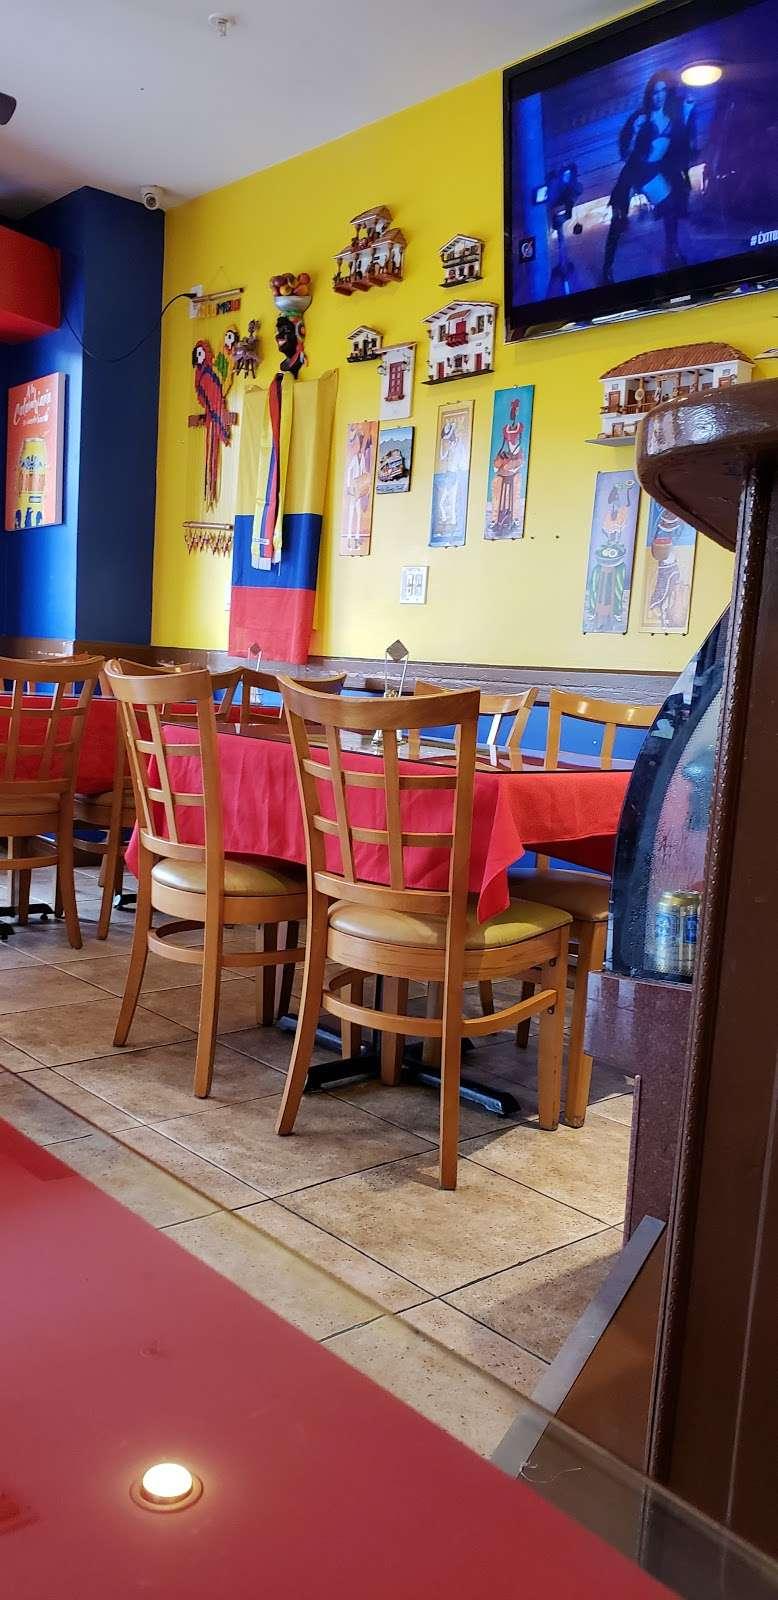 Pimpollo - restaurant    Photo 1 of 10   Address: 32-39 Junction Blvd, East Elmhurst, NY 11369, USA   Phone: (718) 205-5508